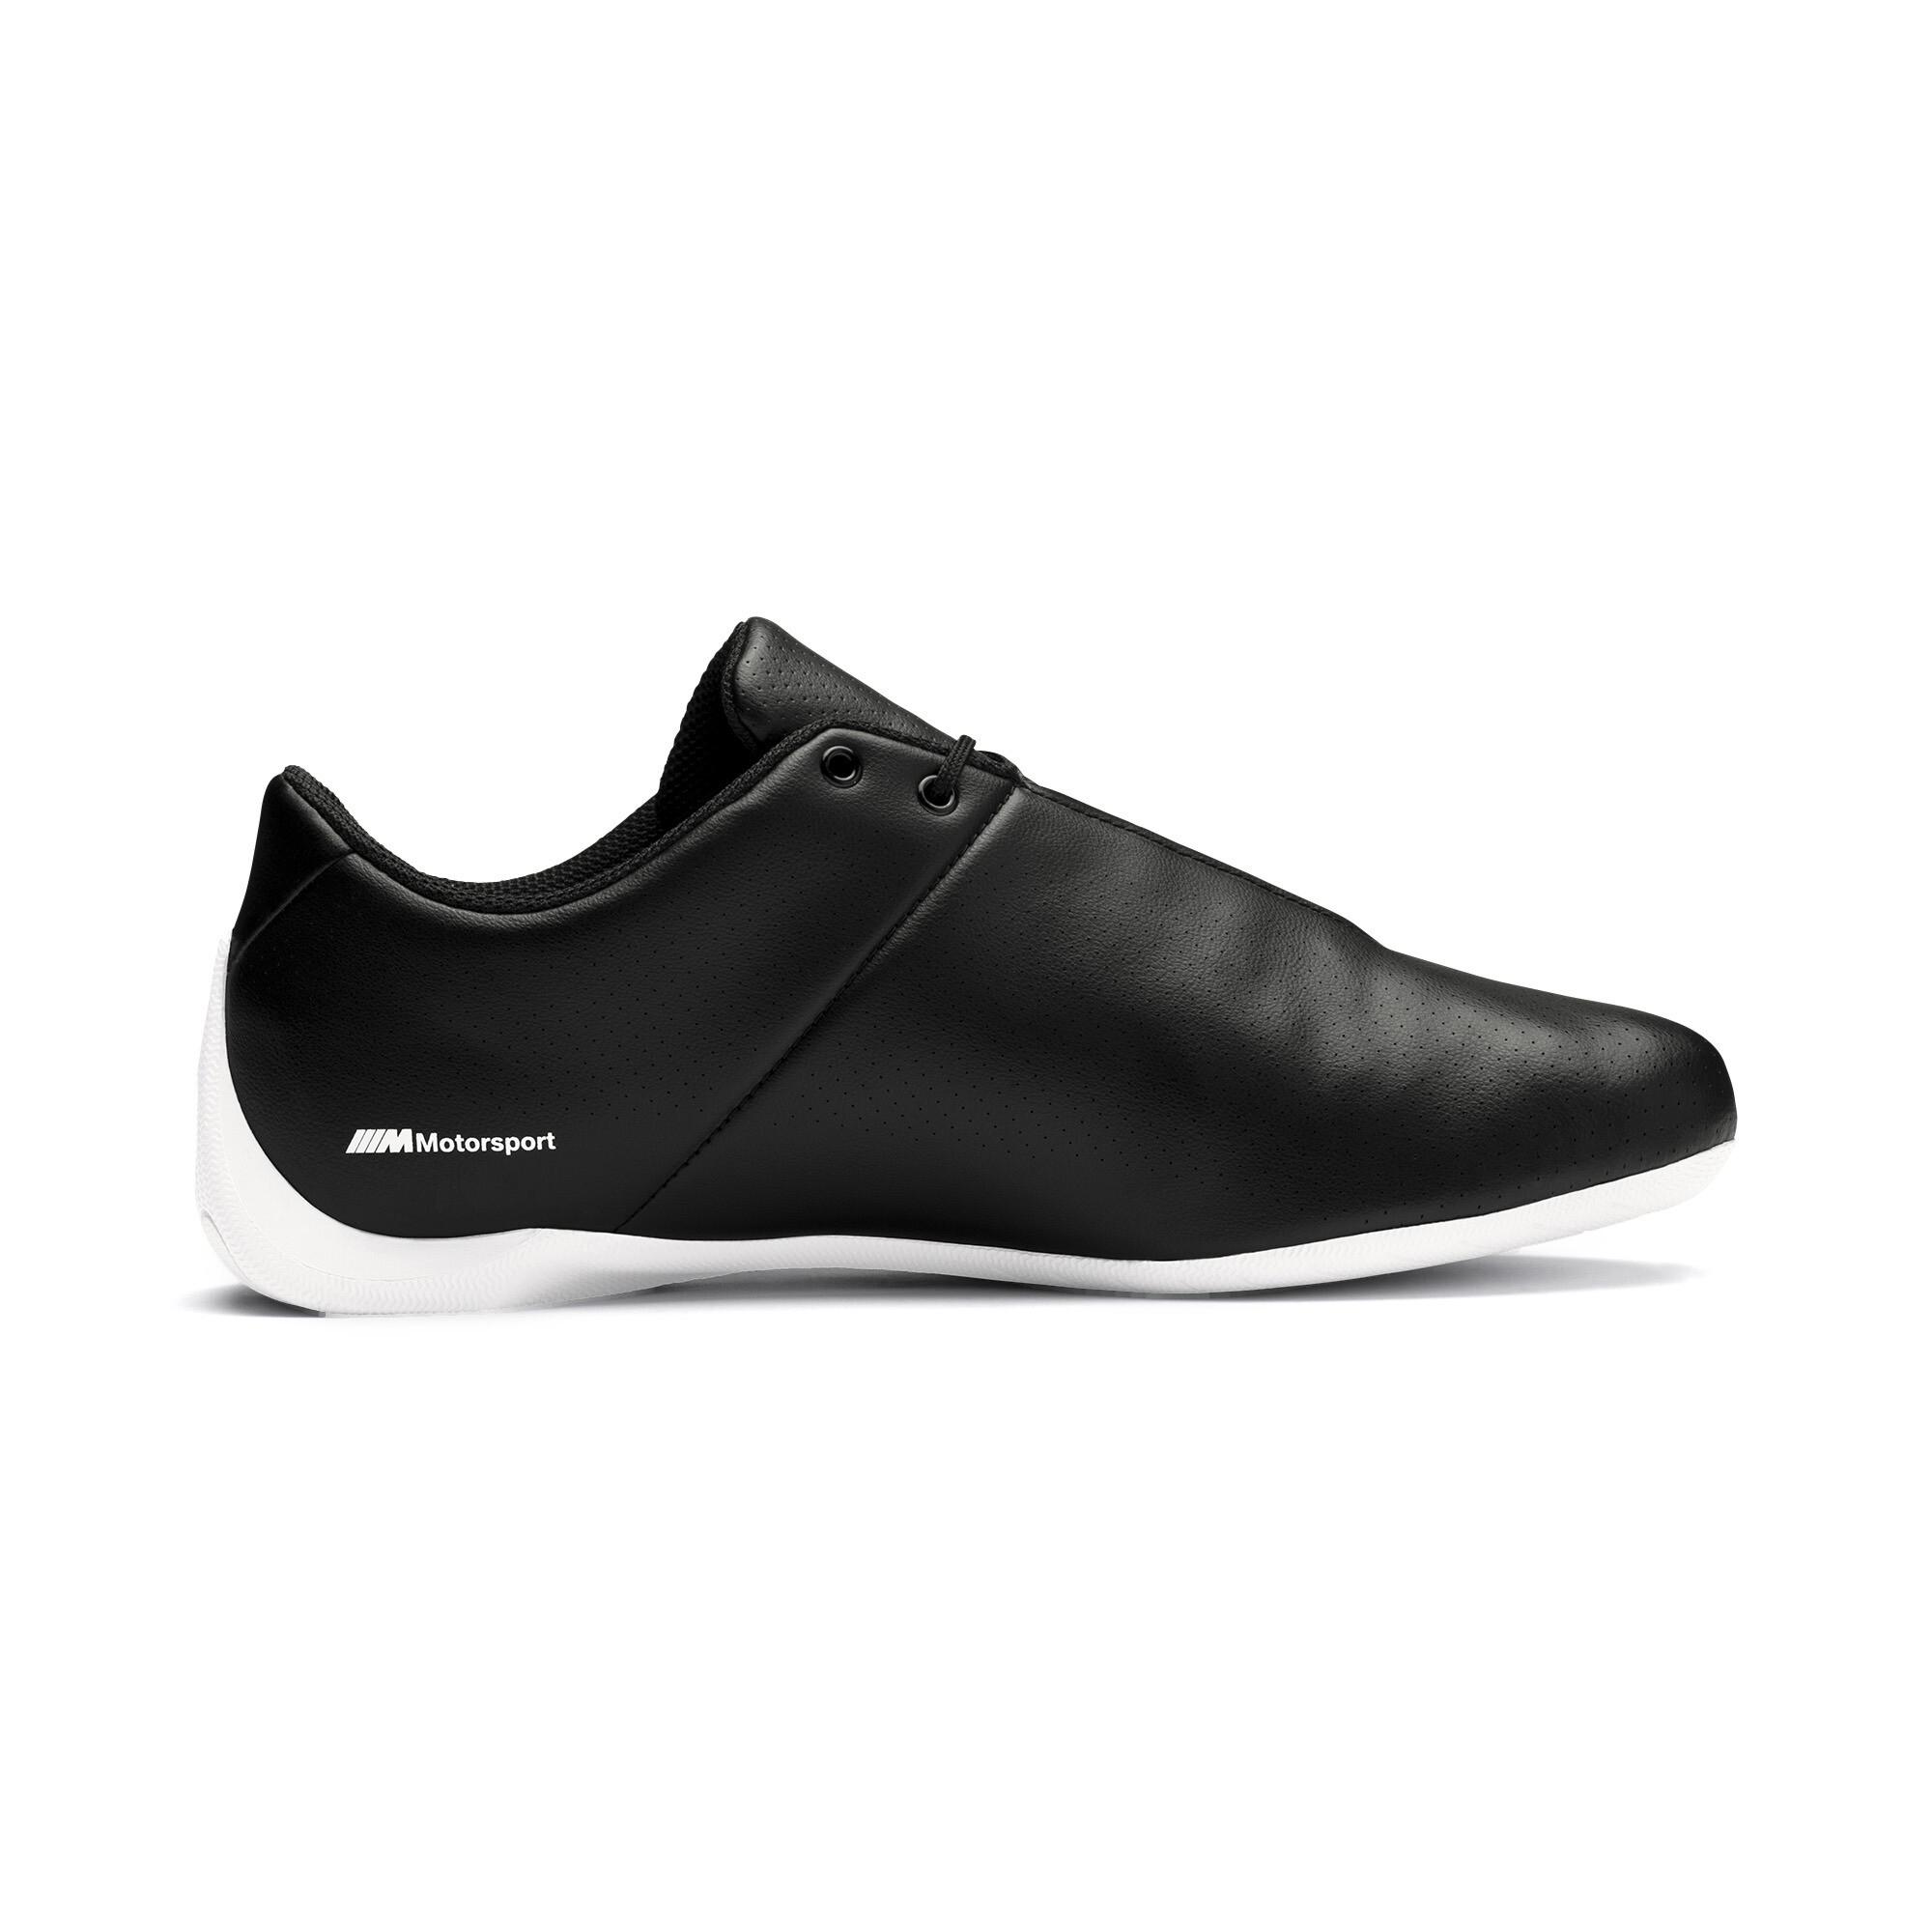 Indexbild 21 - PUMA BMW M Motorsport Future Cat Ultra Sneaker Unisex Schuhe Neu